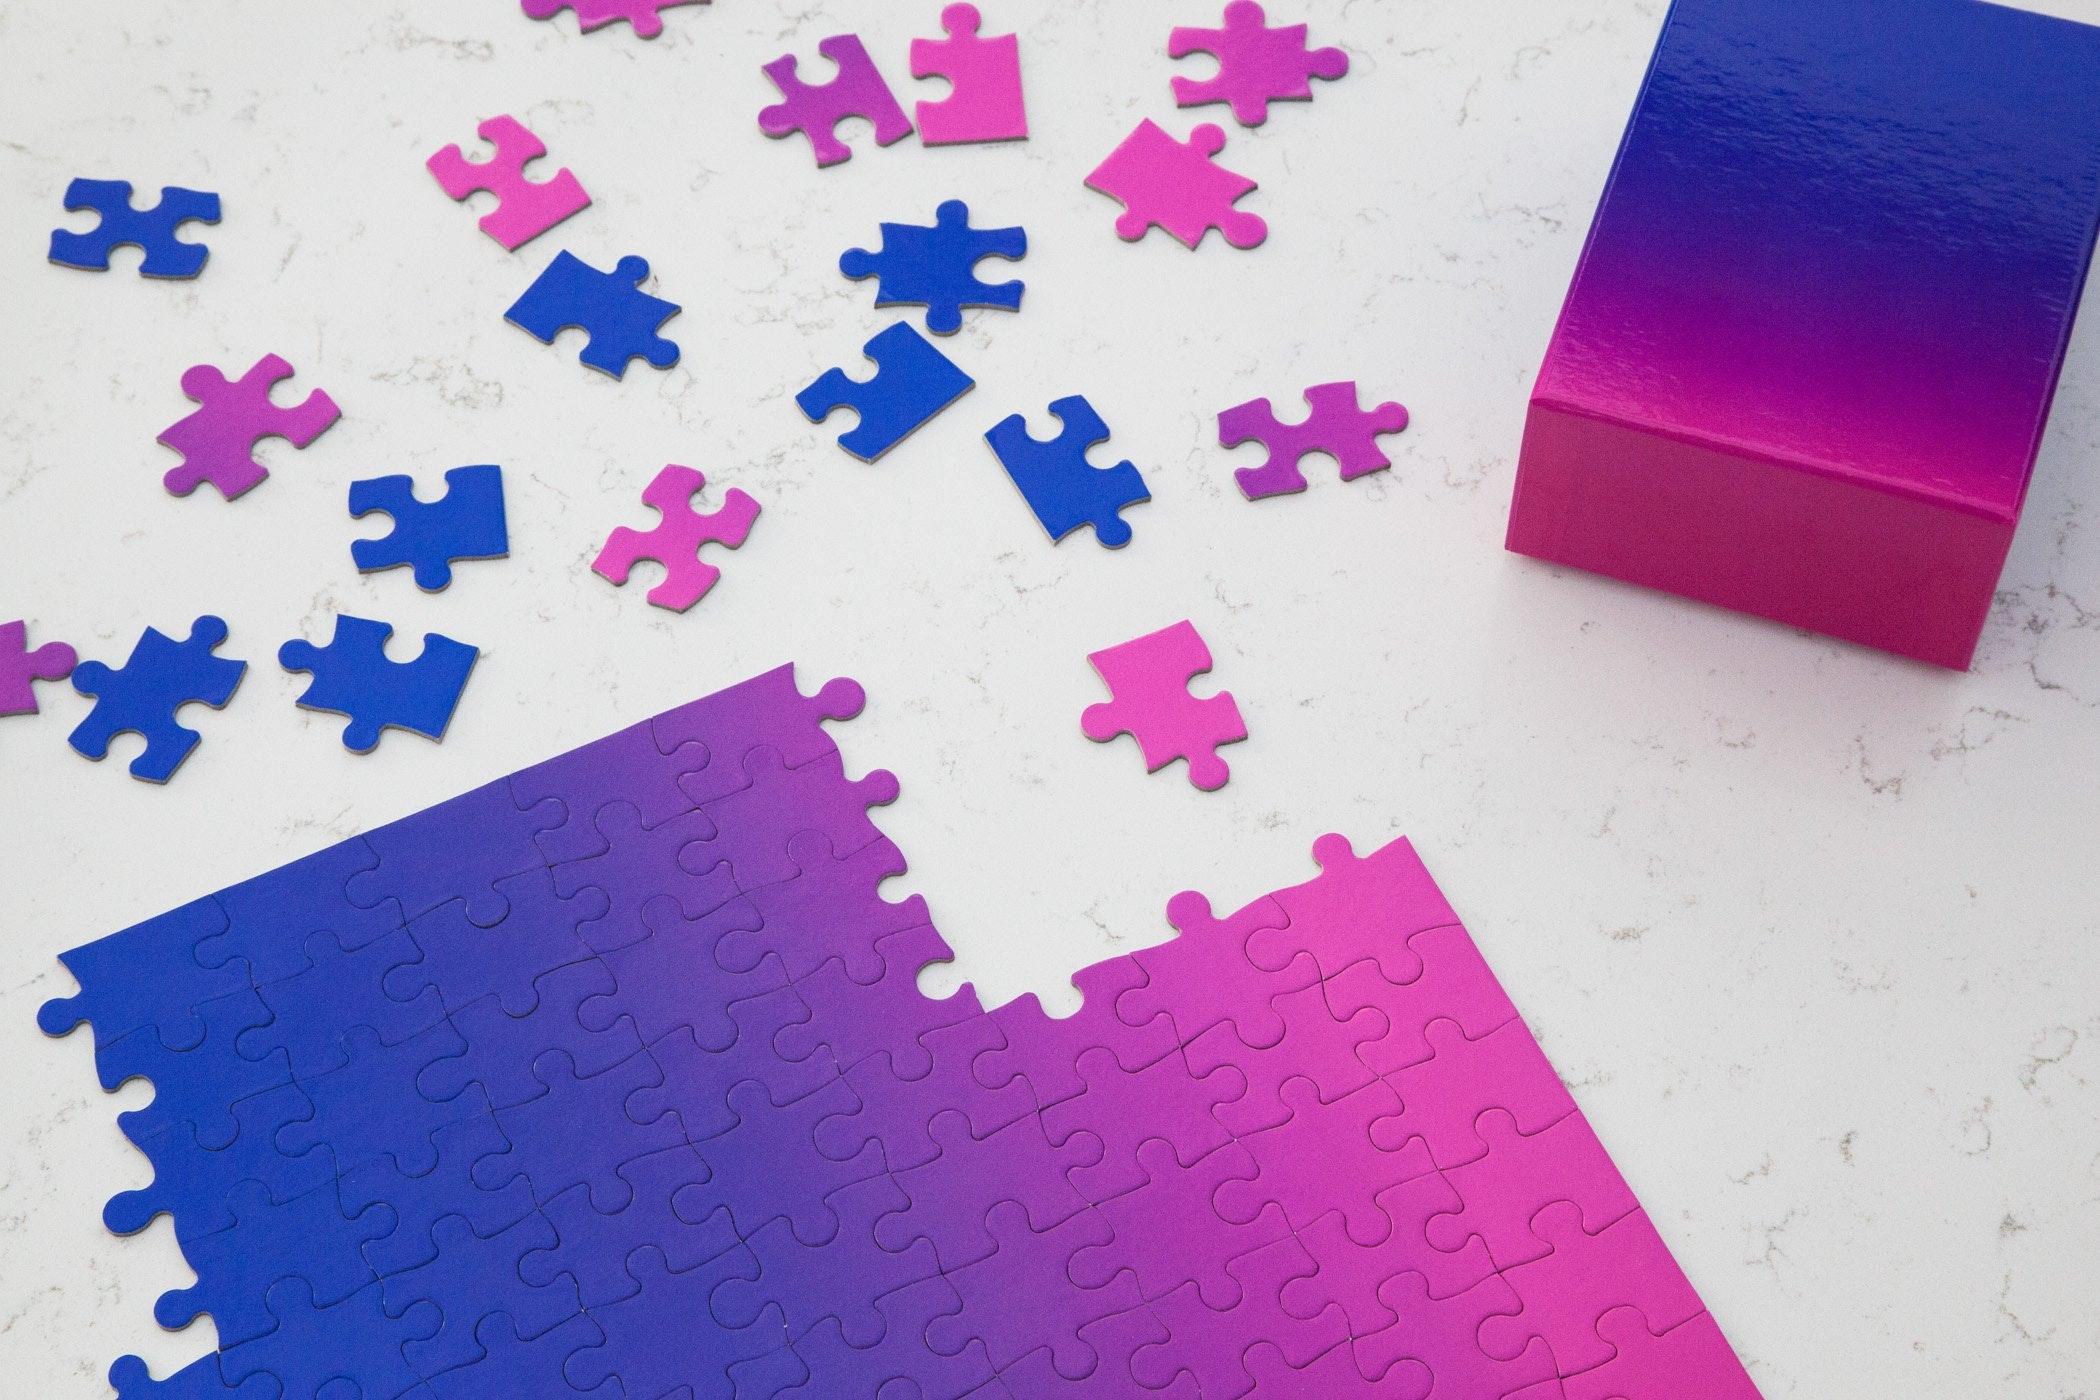 Bryce Wilner gradient puzzle